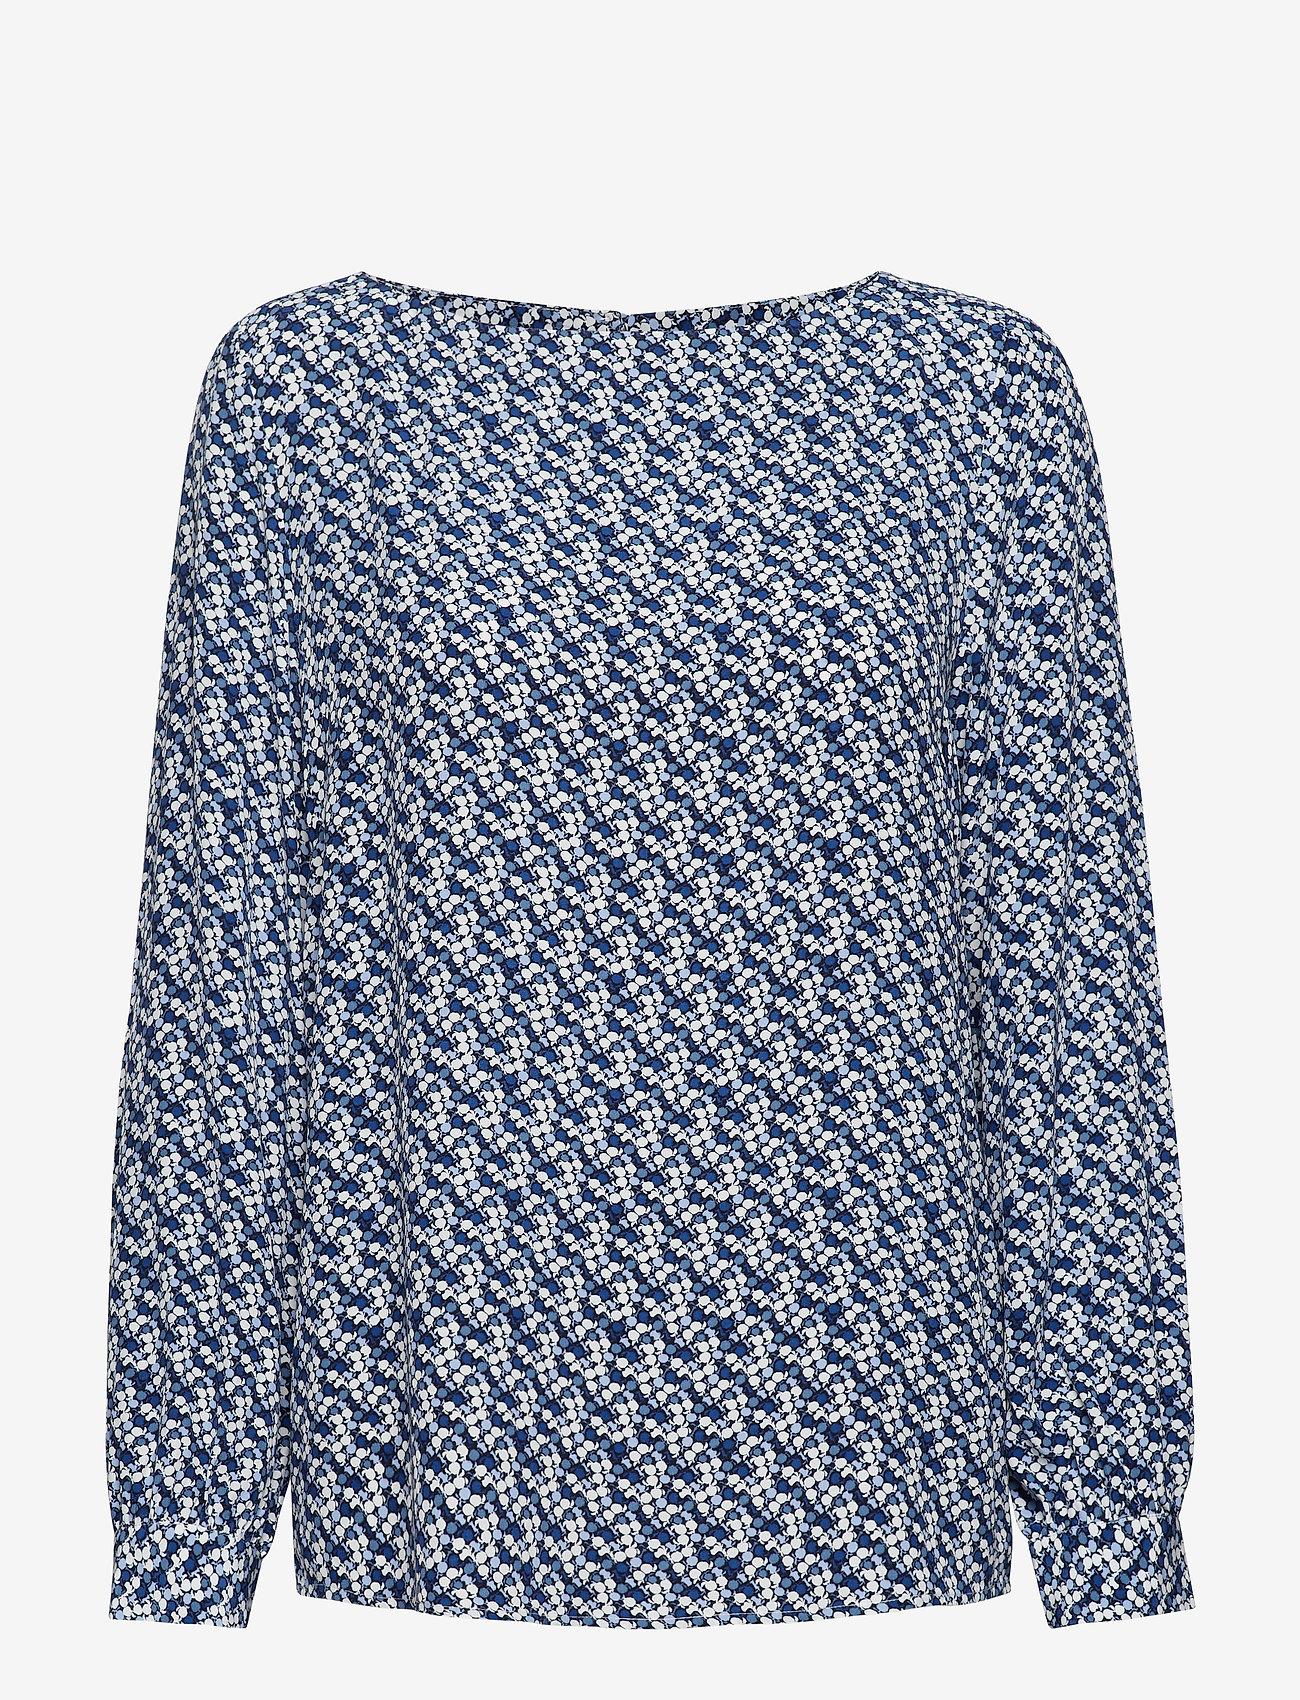 Gant - D1. AUTUMN PRINT VISCOSE BLOUSE - pitkähihaiset puserot - crisp blue